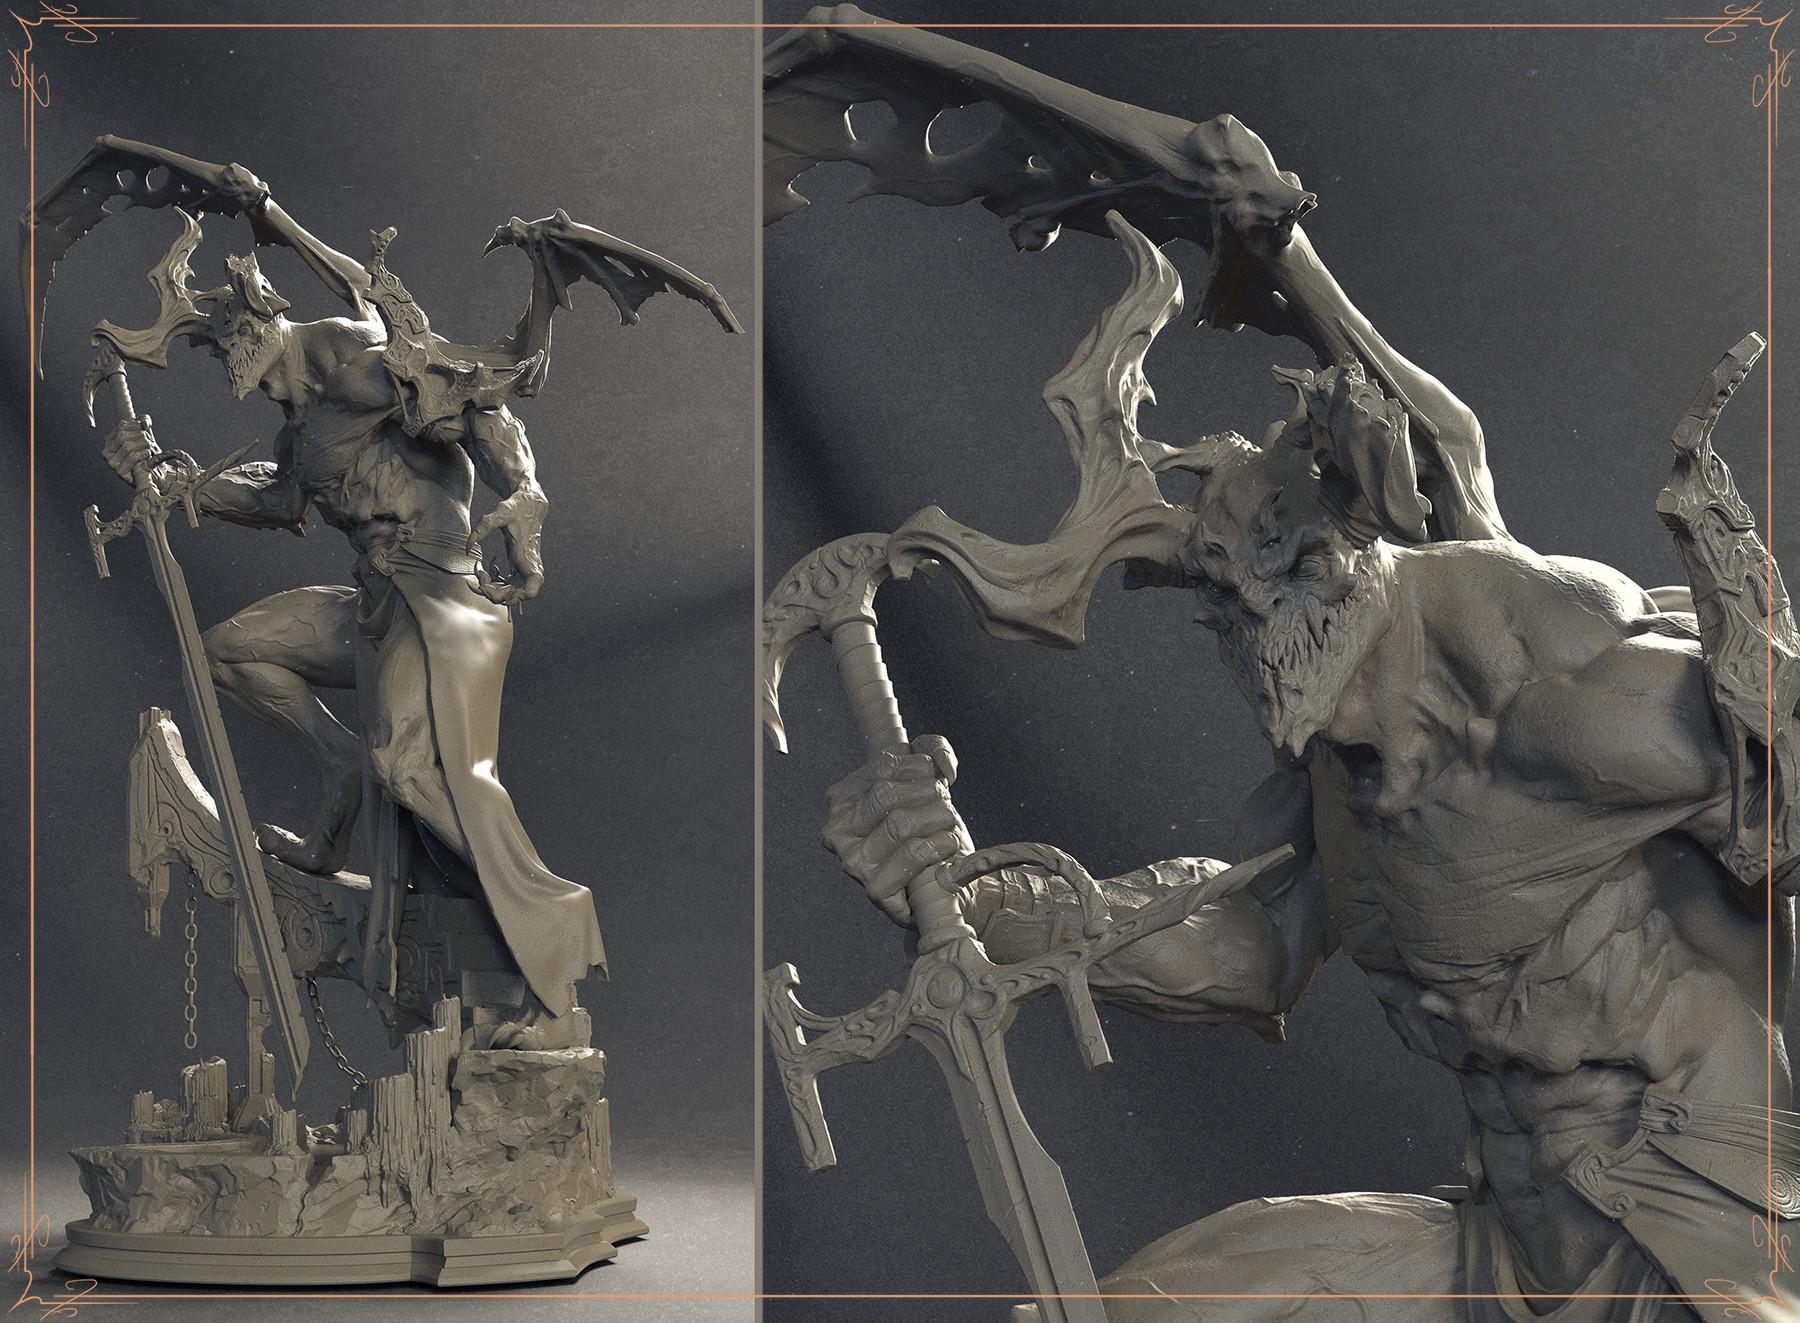 Alvaro ribeiro demon3